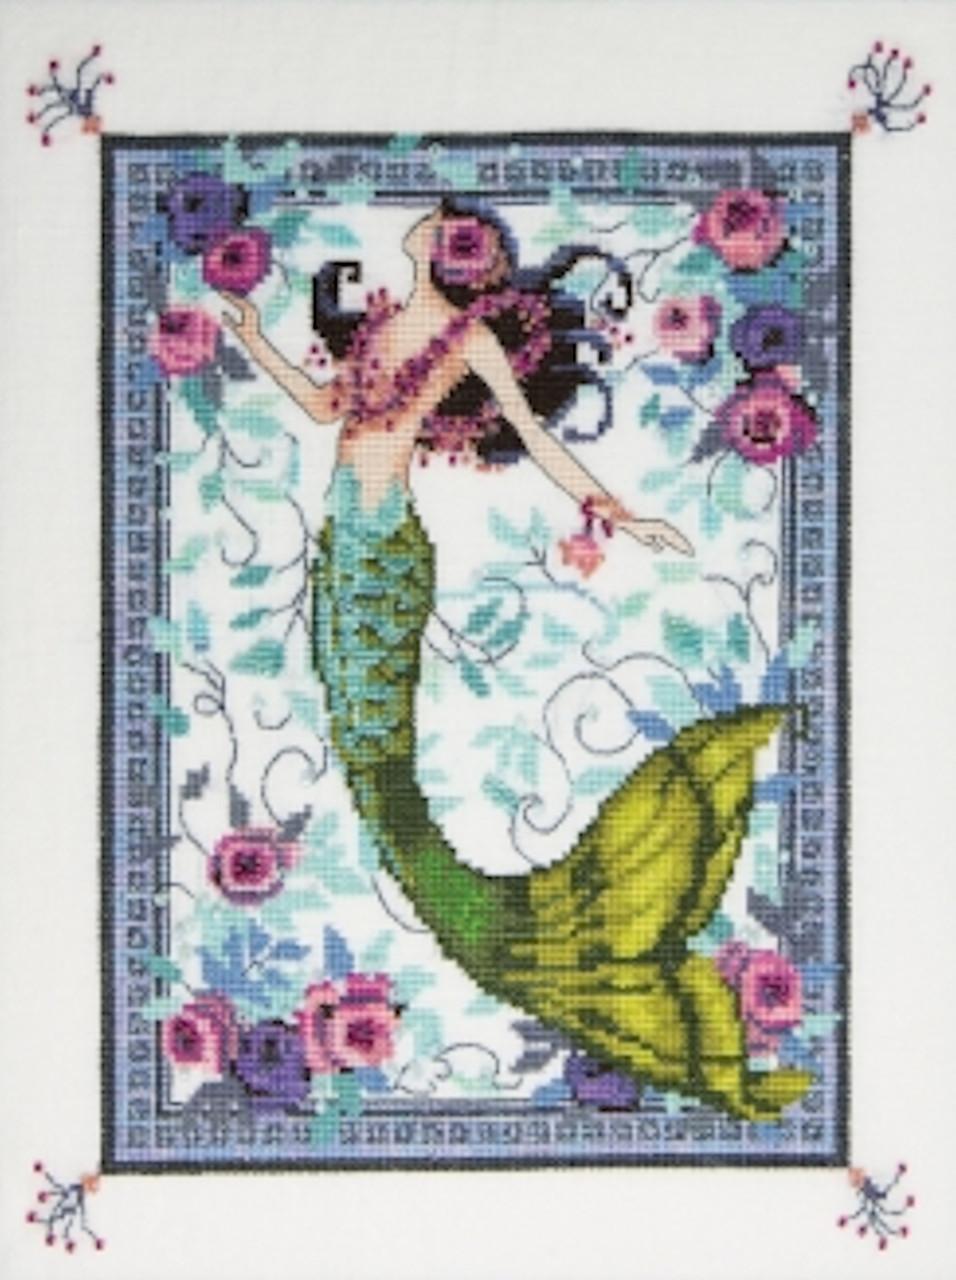 Nora  Corbett - Moonlight Laguna Mermaid